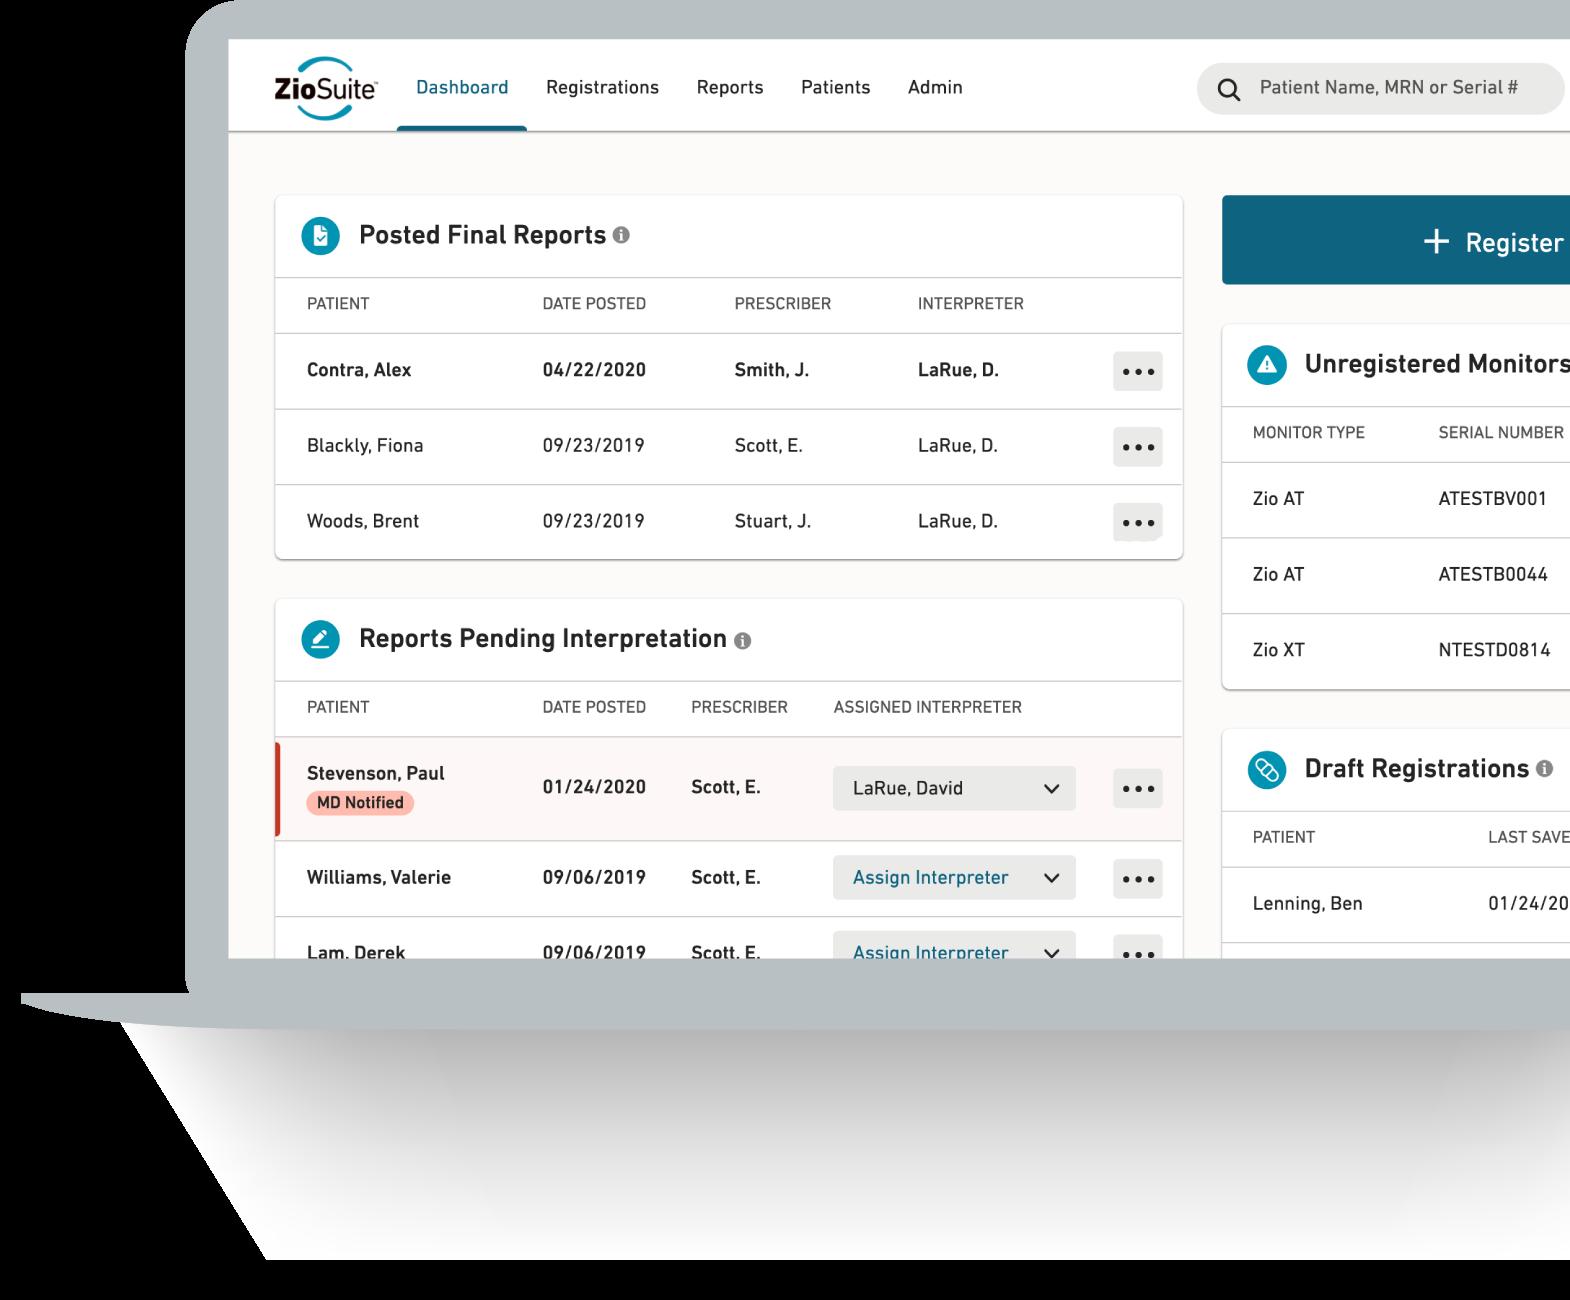 Dashboard of ZioSuite patient management portal on laptop